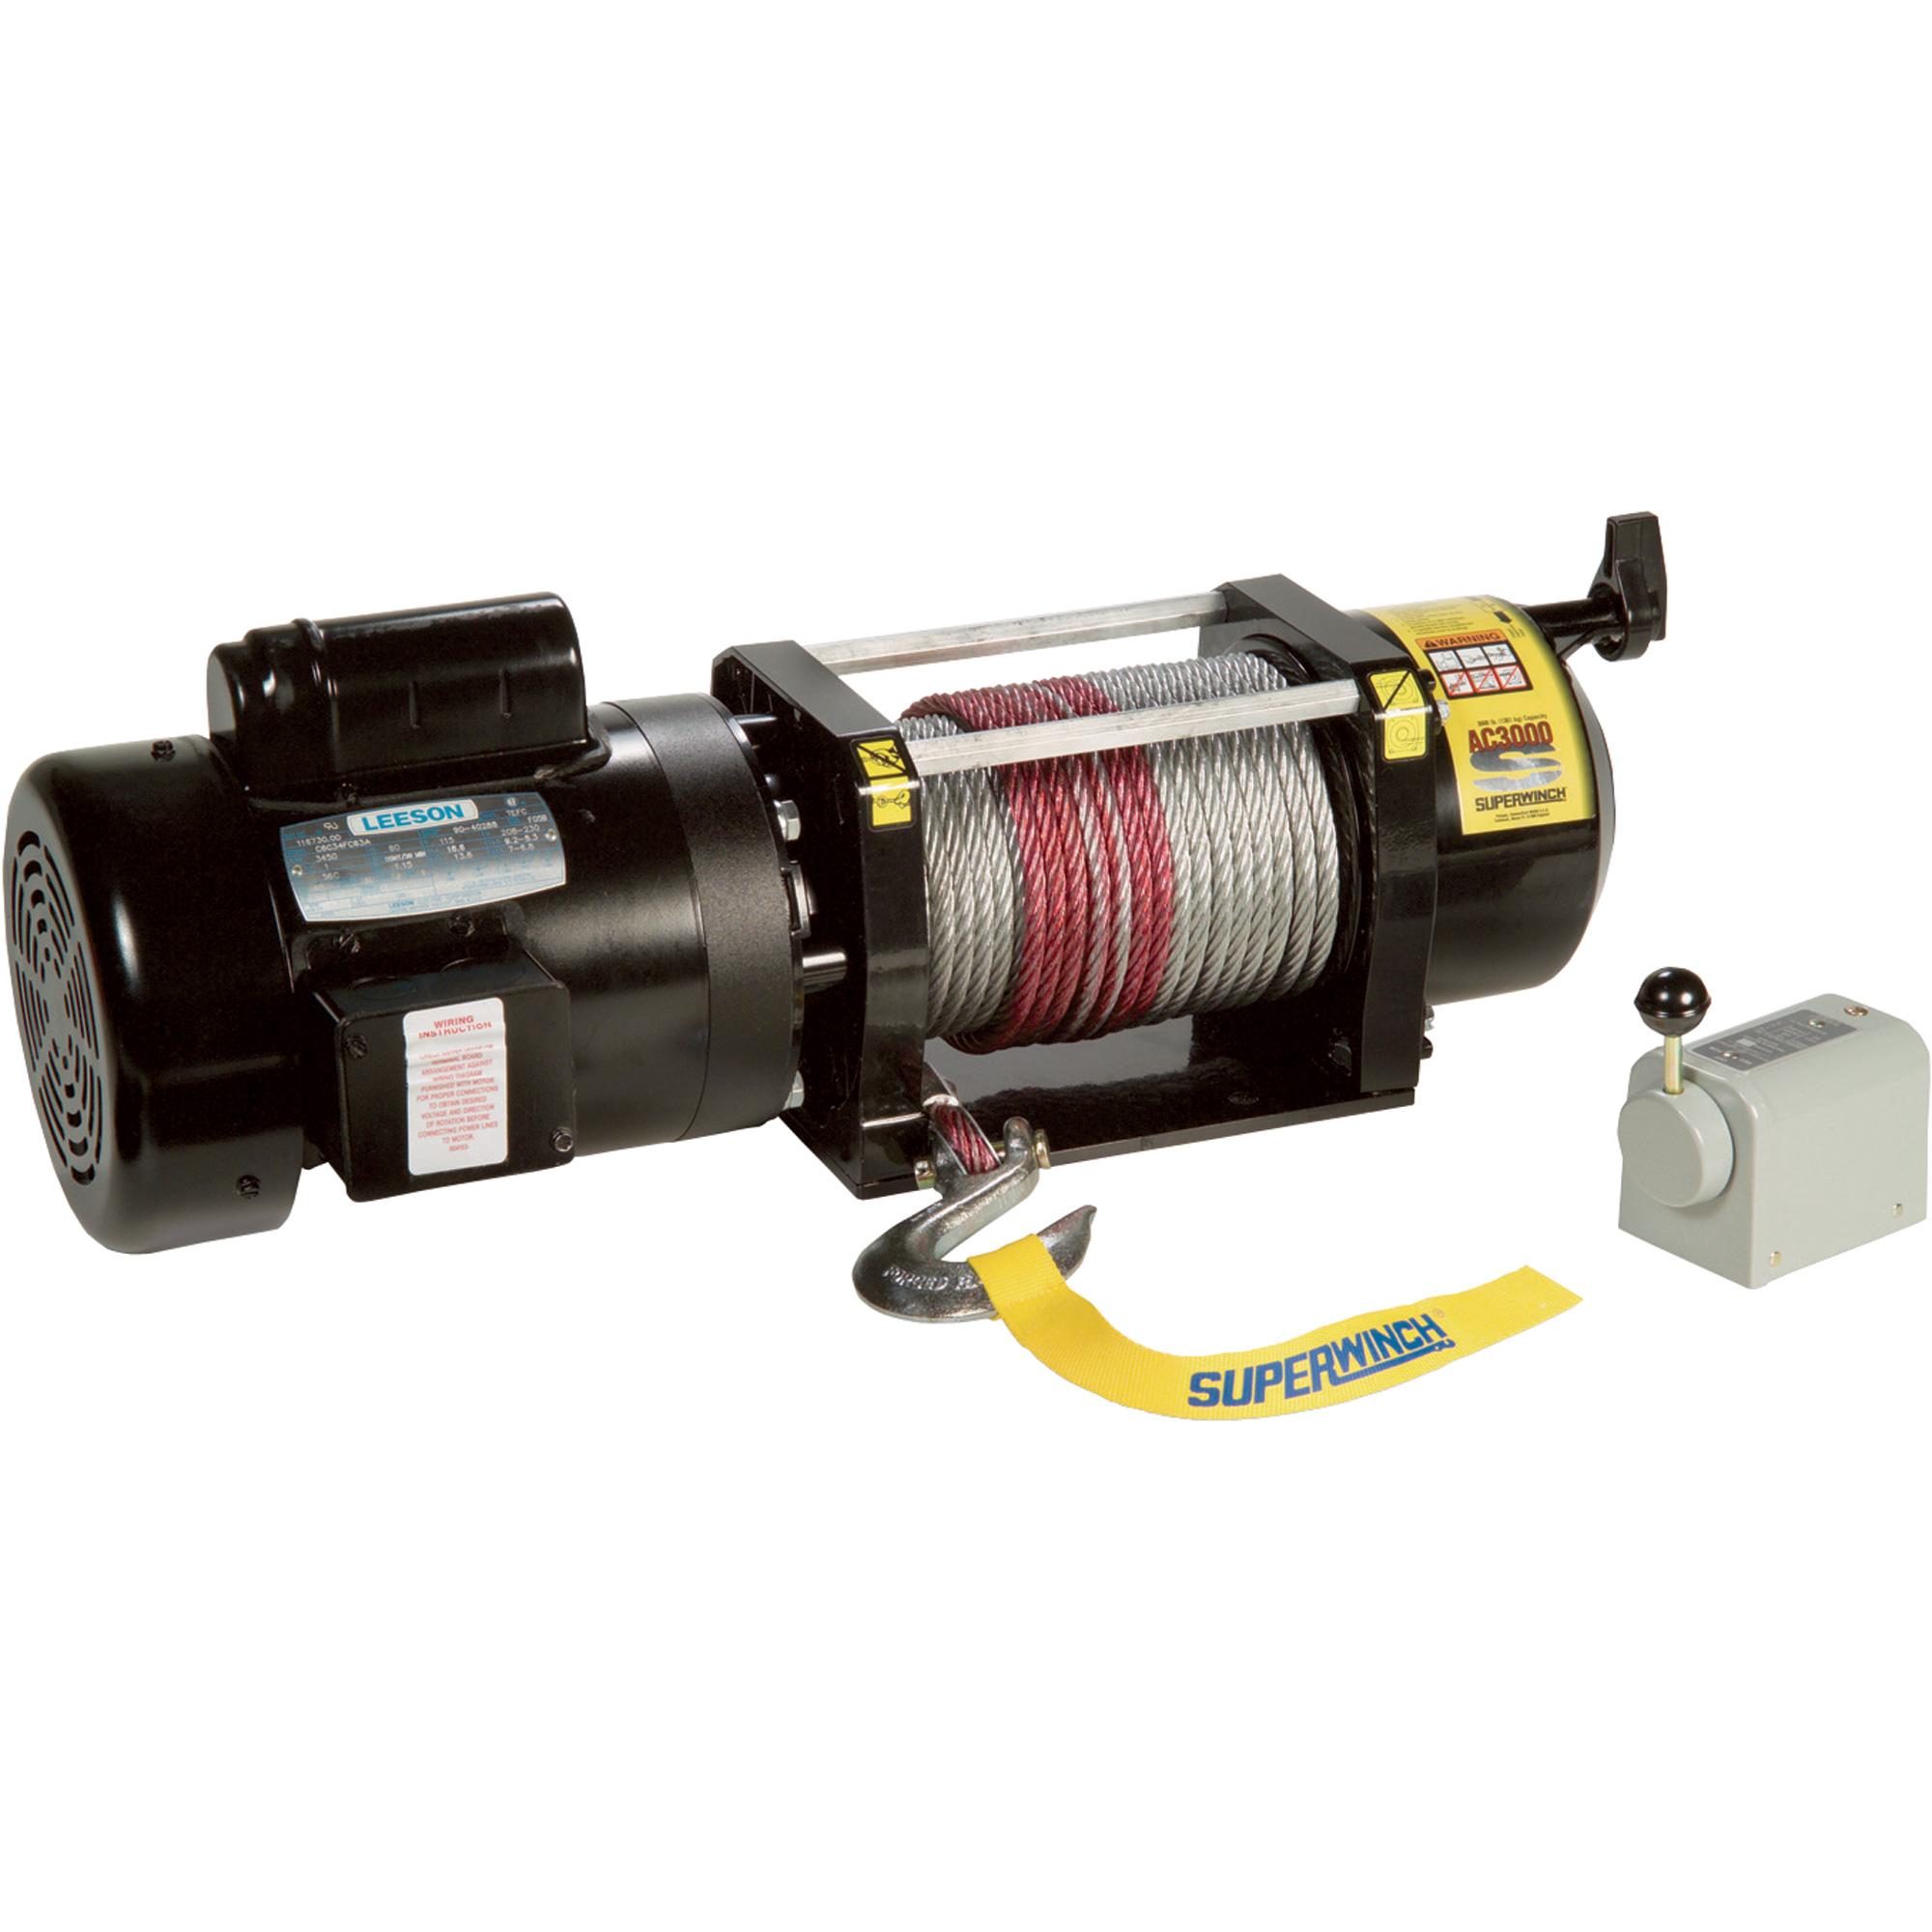 110 Volt Winch Wiring Diagram Polk Audio Car Subwoofer Wiring Kits Fusebox Cukk Jeanjaures37 Fr